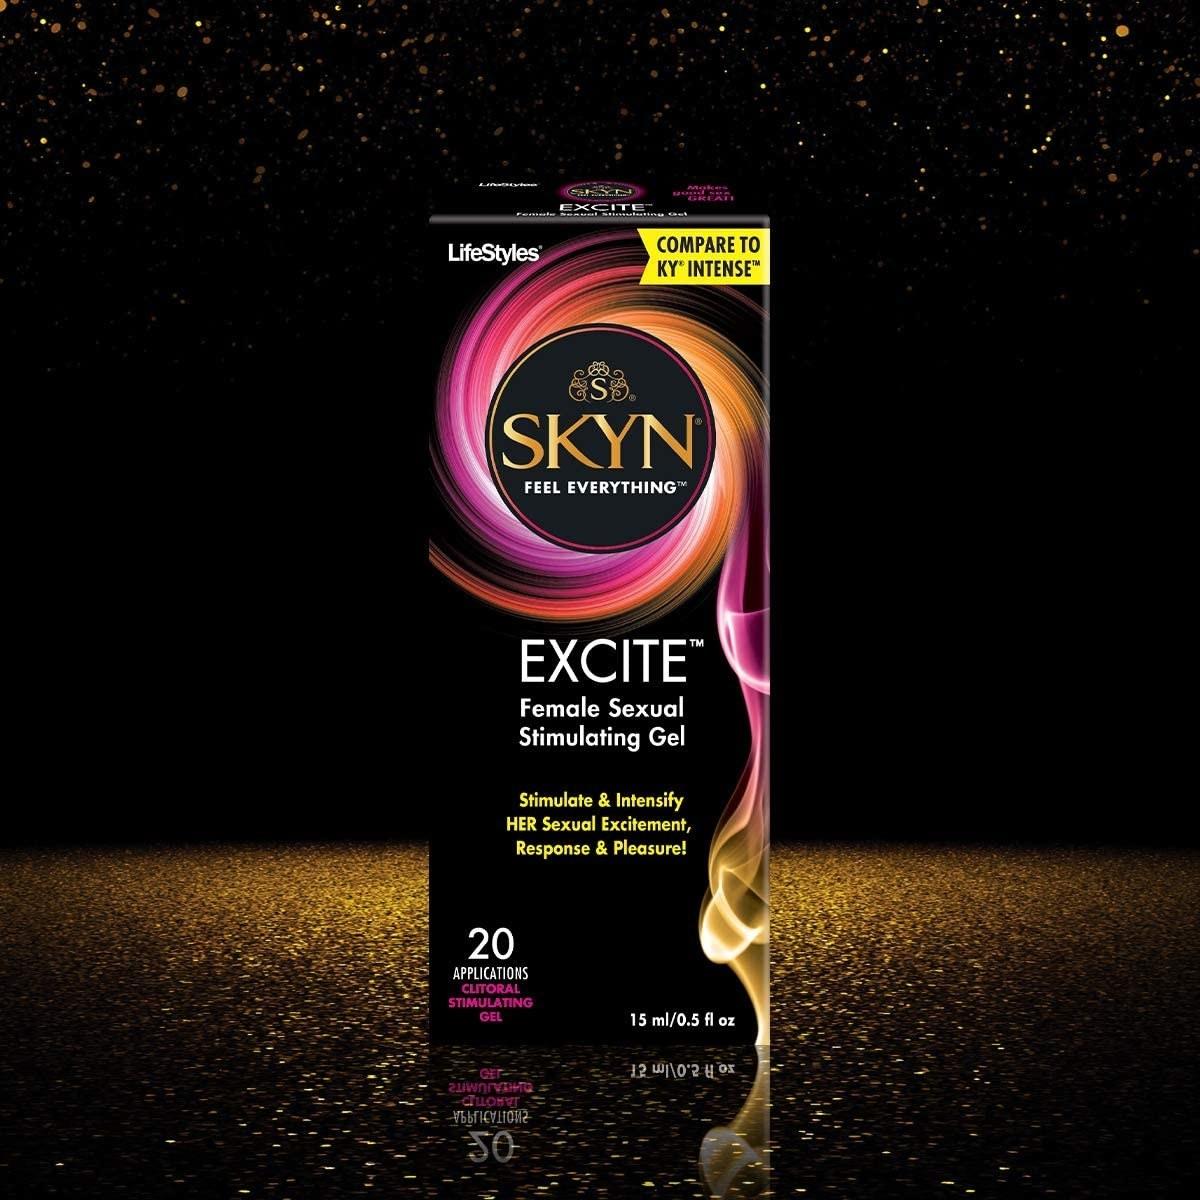 Black and pink box of SKYN Excite stimulating gel